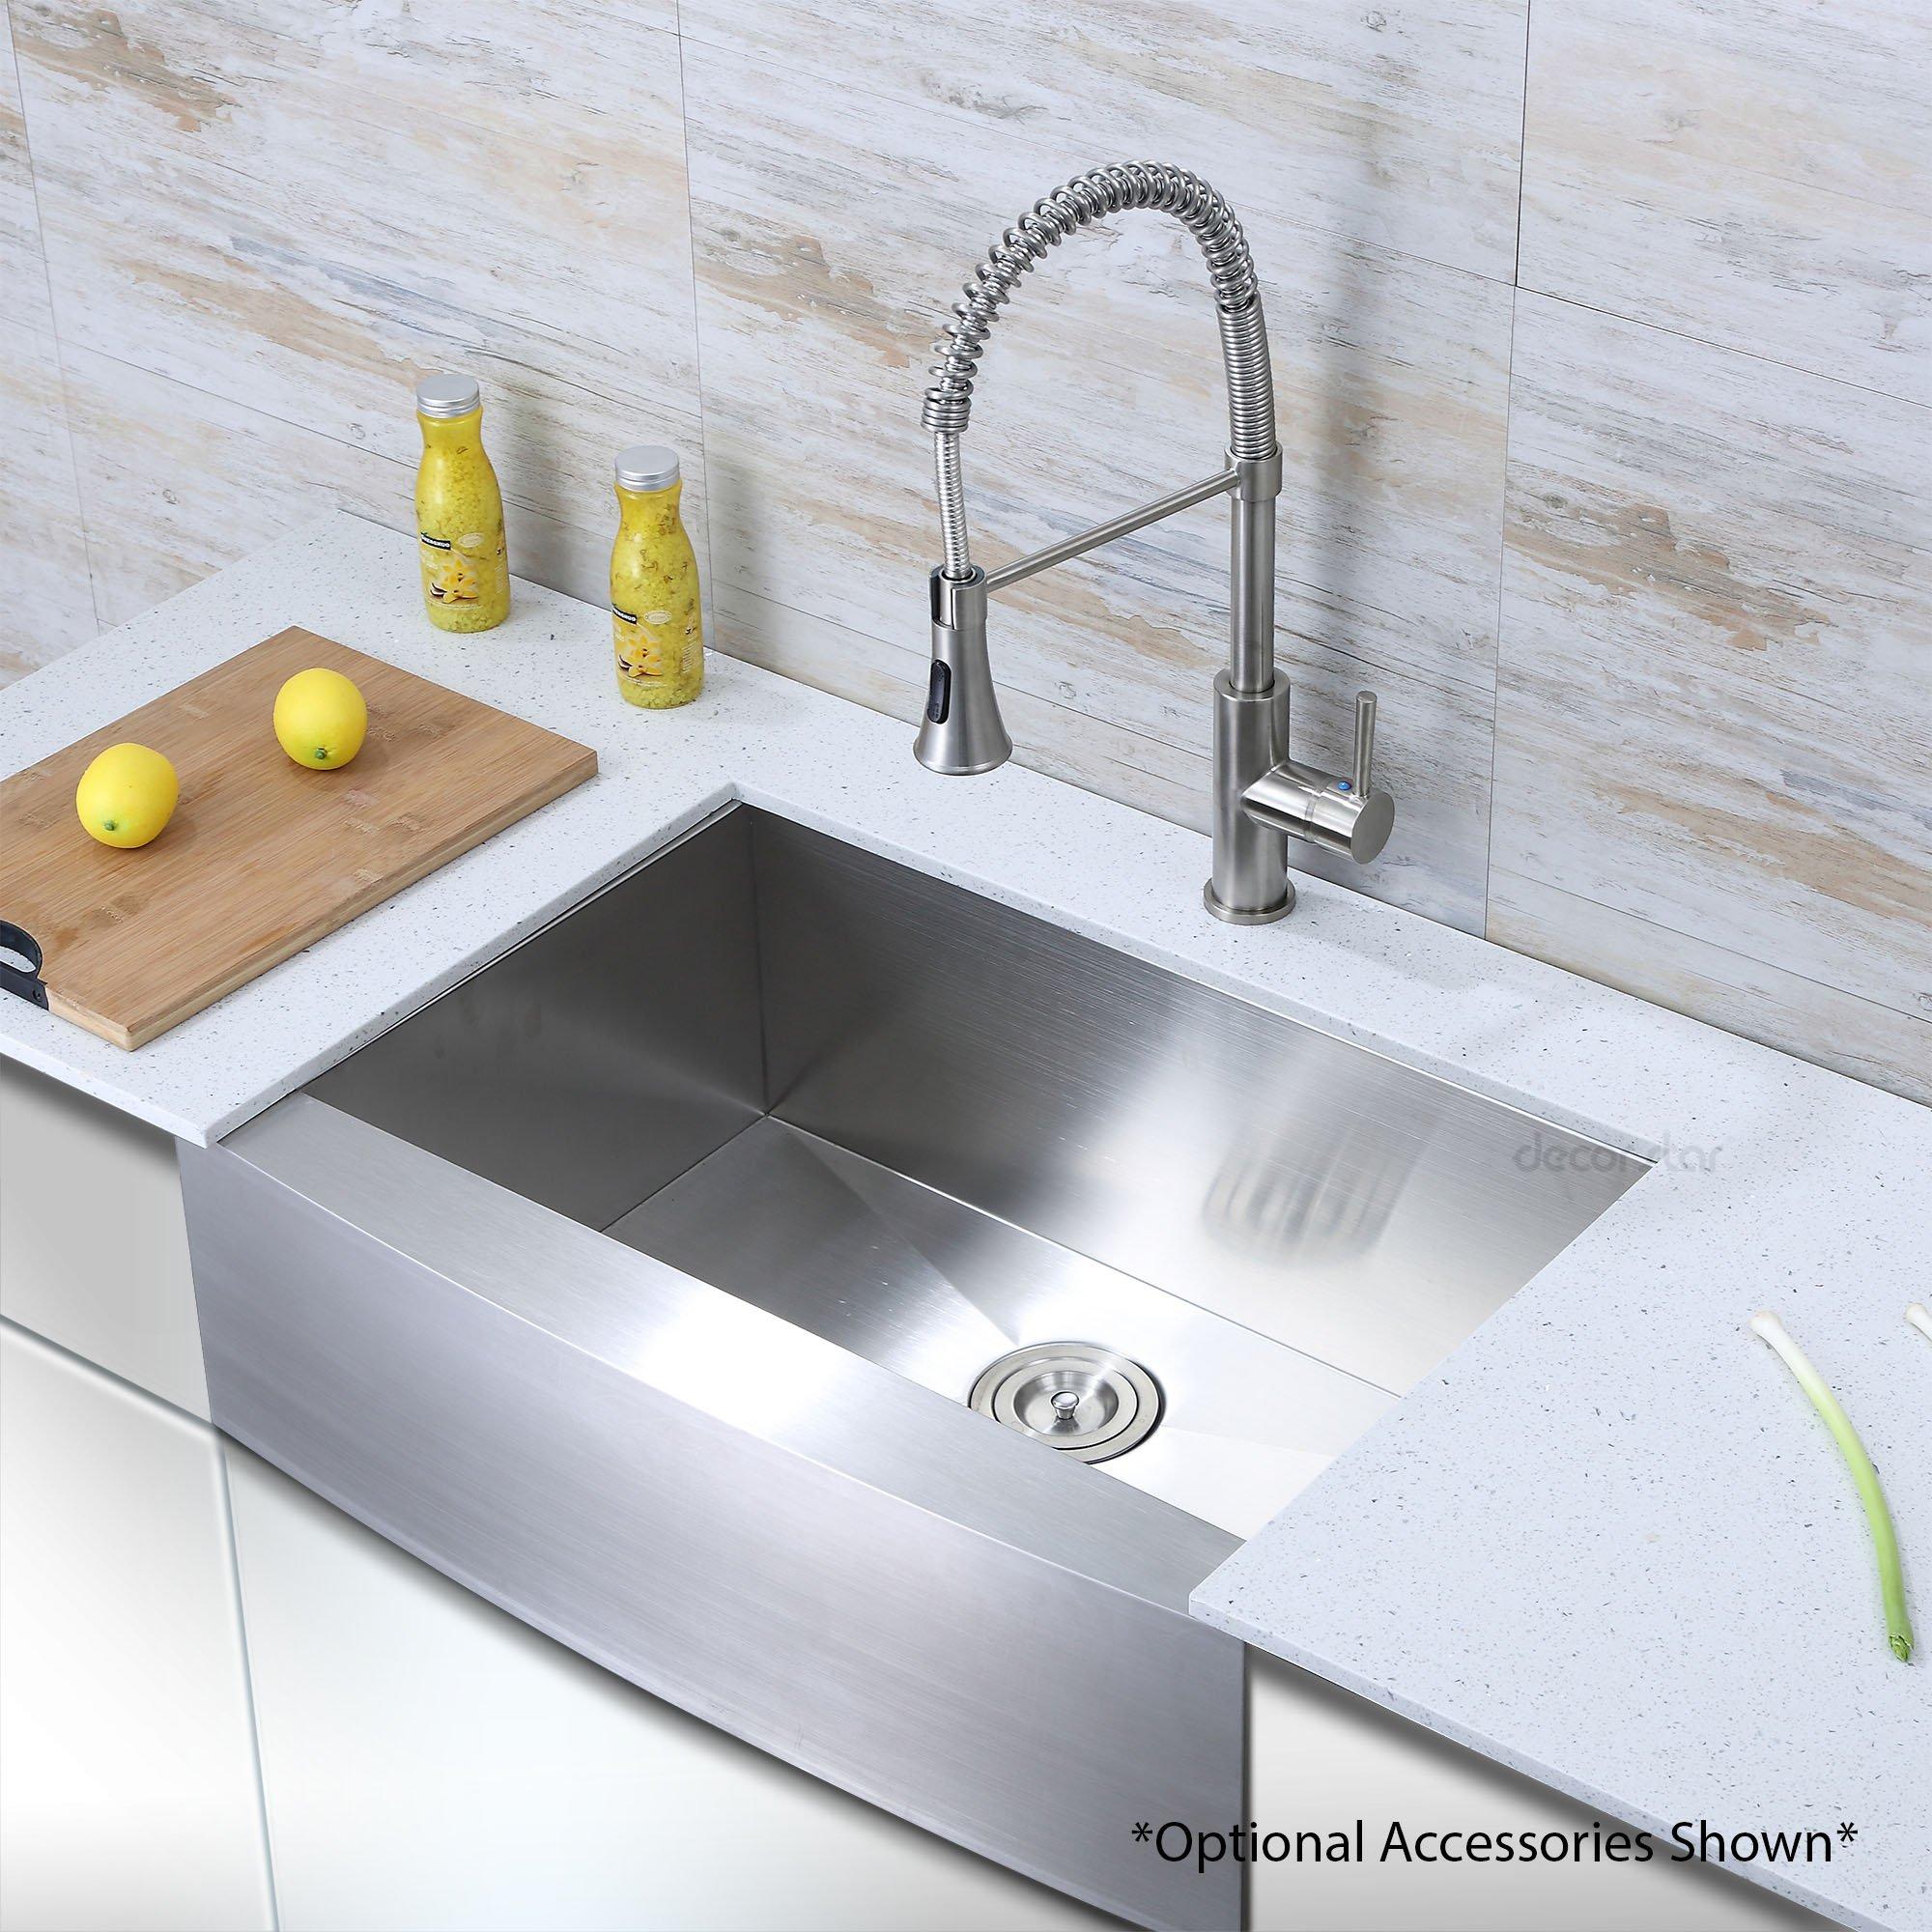 Decor Star F-001-Z 30 Inch x 21 Inch Farmhouse Apron Single Bowl 16 Gauge Stainless Steel Luxury Handmade Kitchen Sink cUPC Zero Radius